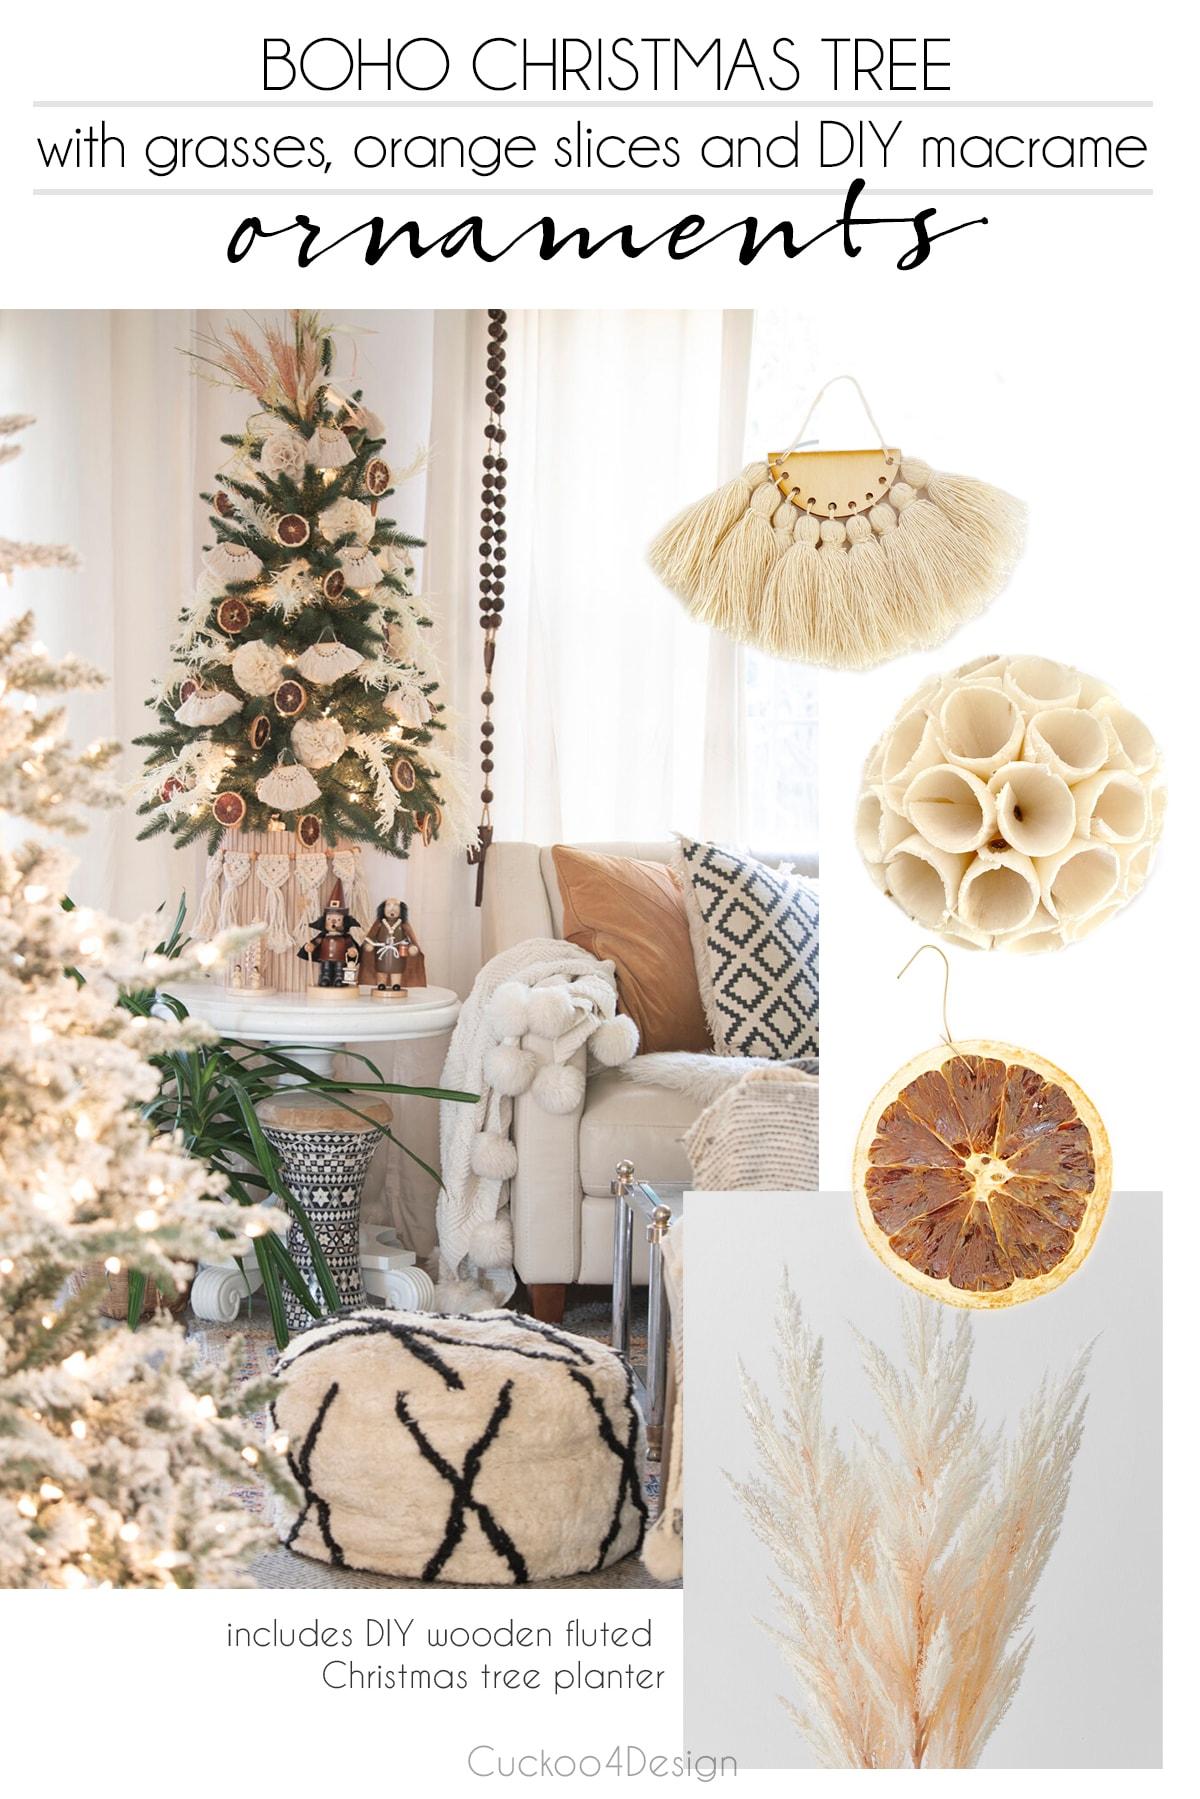 boho christmas tree with handmade macrame ornaments and DIY fluted Christmas tree planter